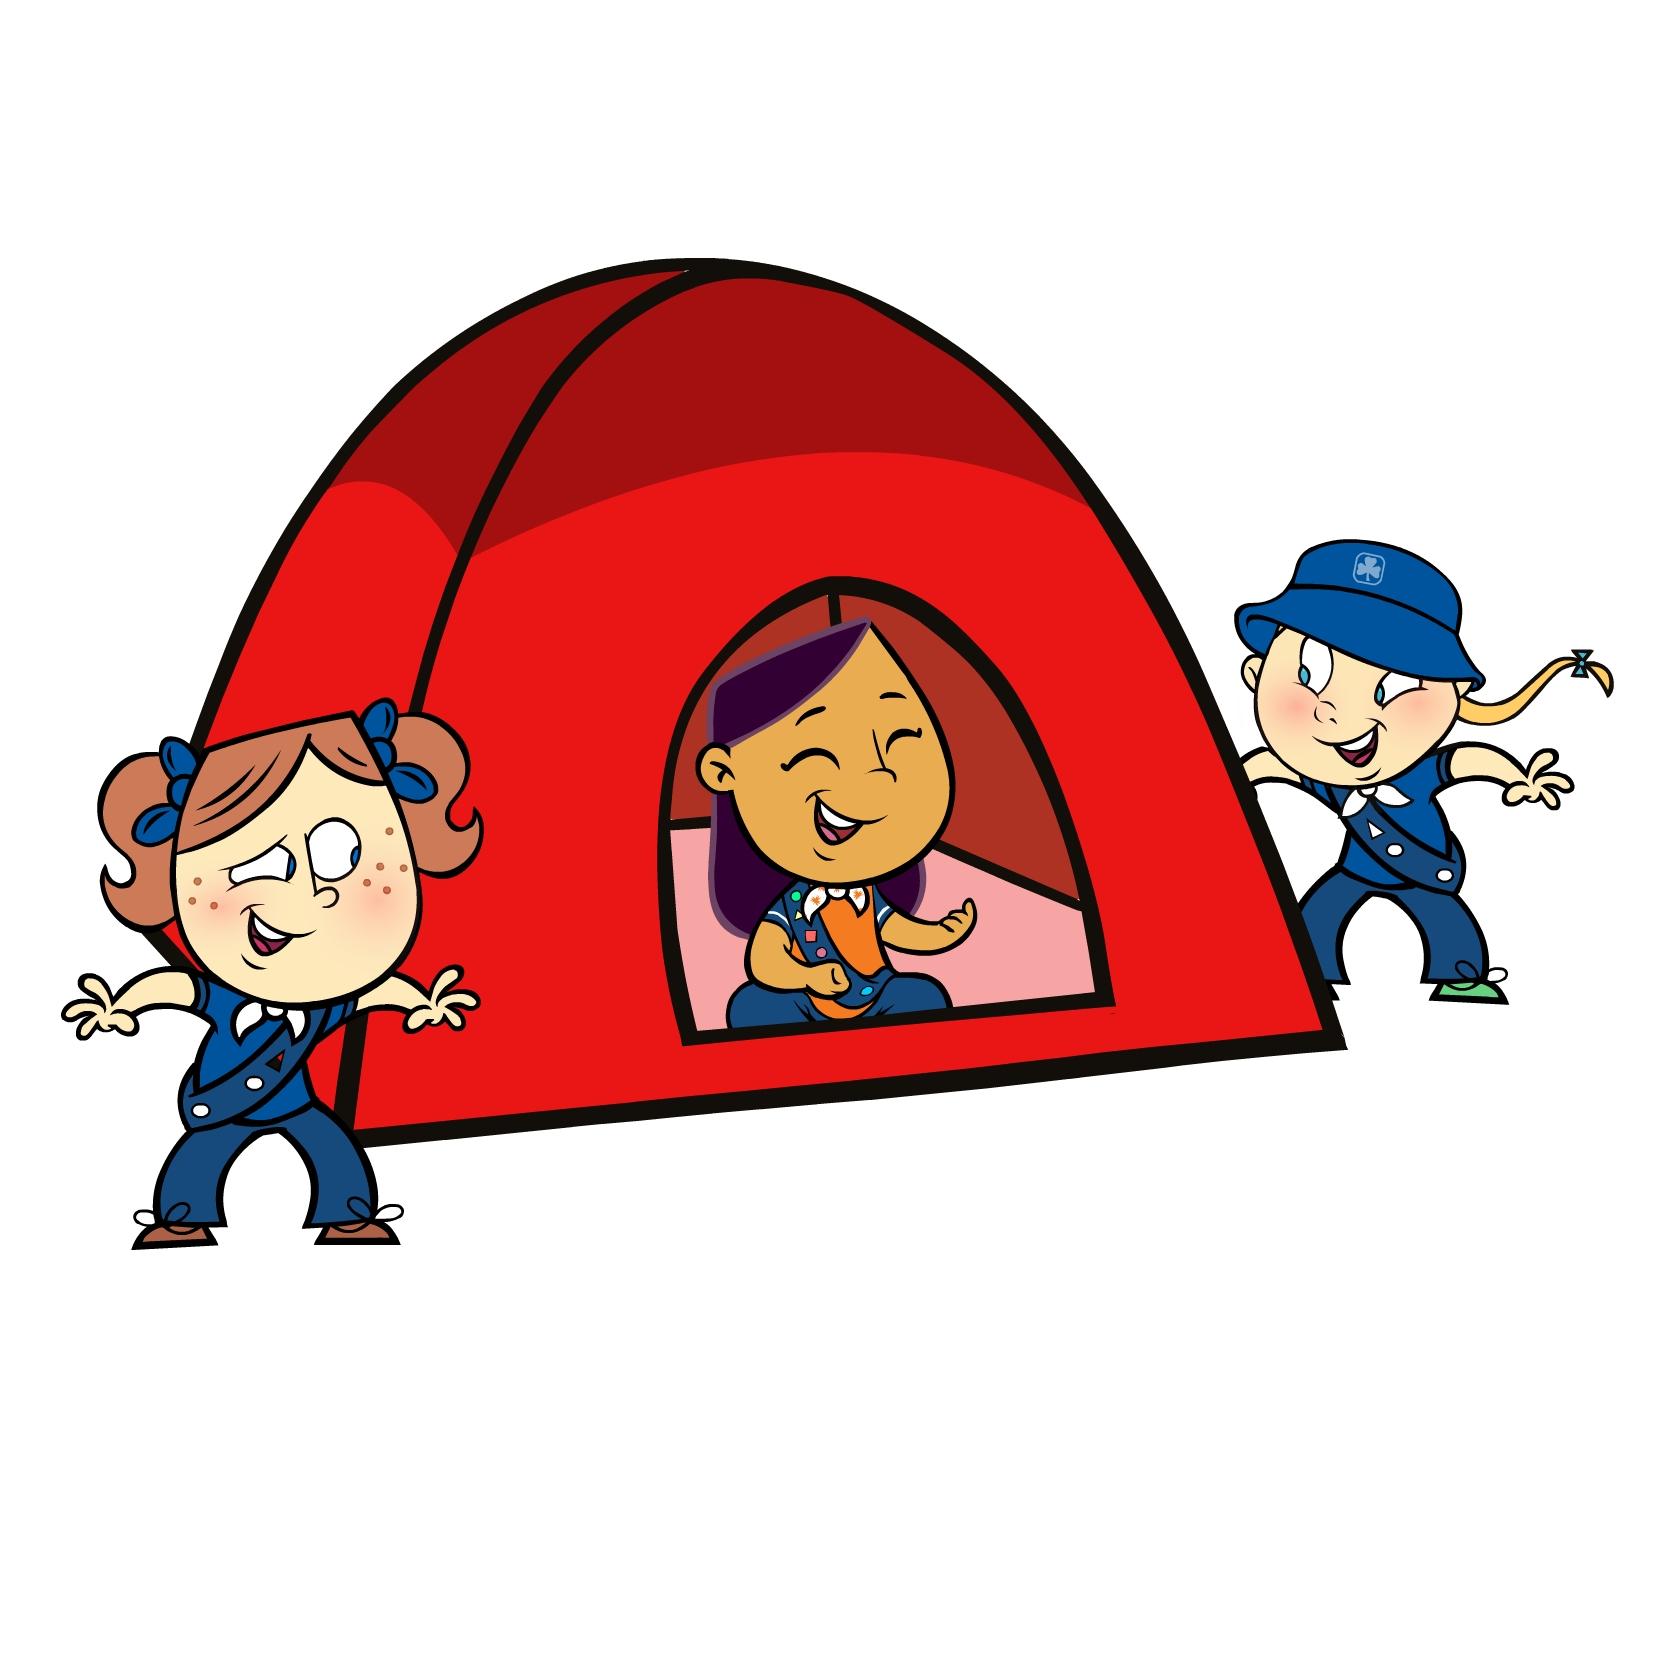 1666x1666 Camp Fire Clipart Camping Lantern